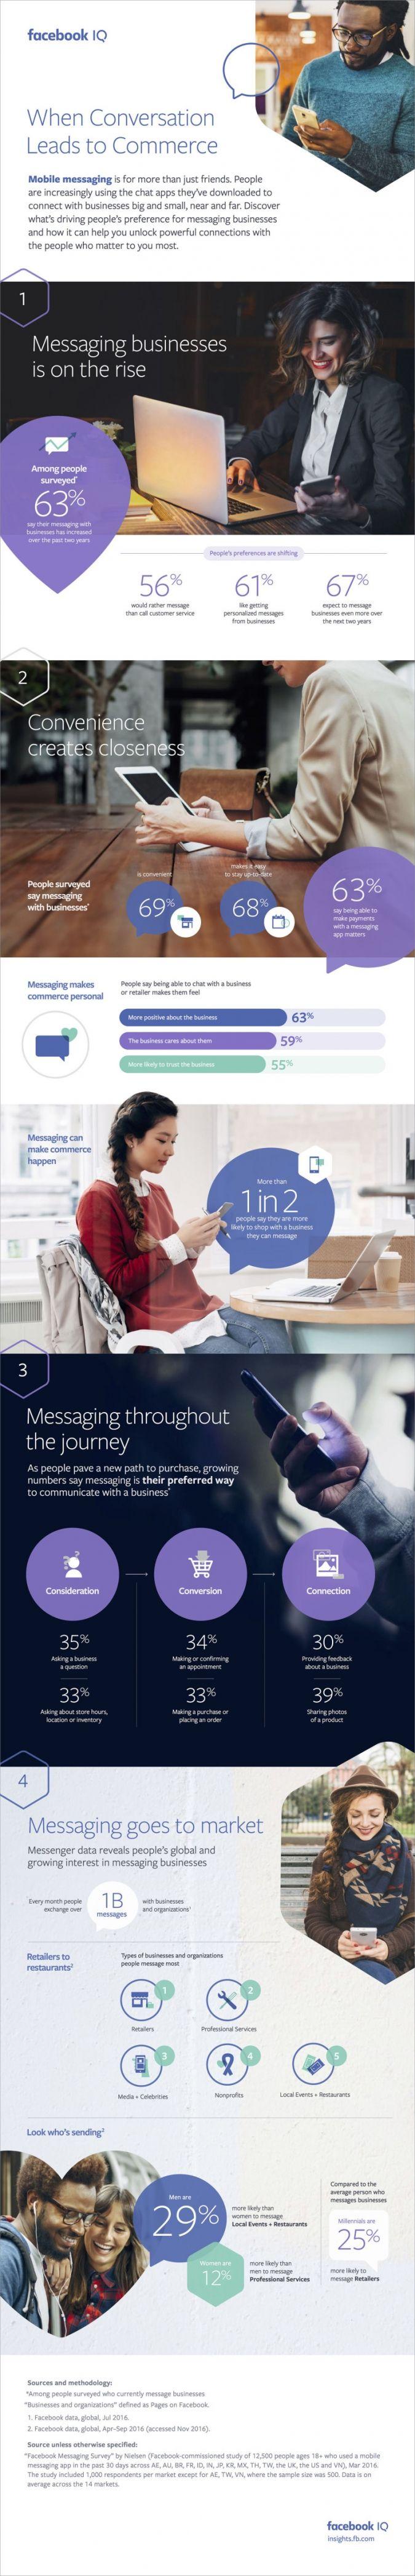 #SocialMedia #Kundenbindung #Leadgenerierung #Social Media #MessengerMarketing #SMM #Infografik